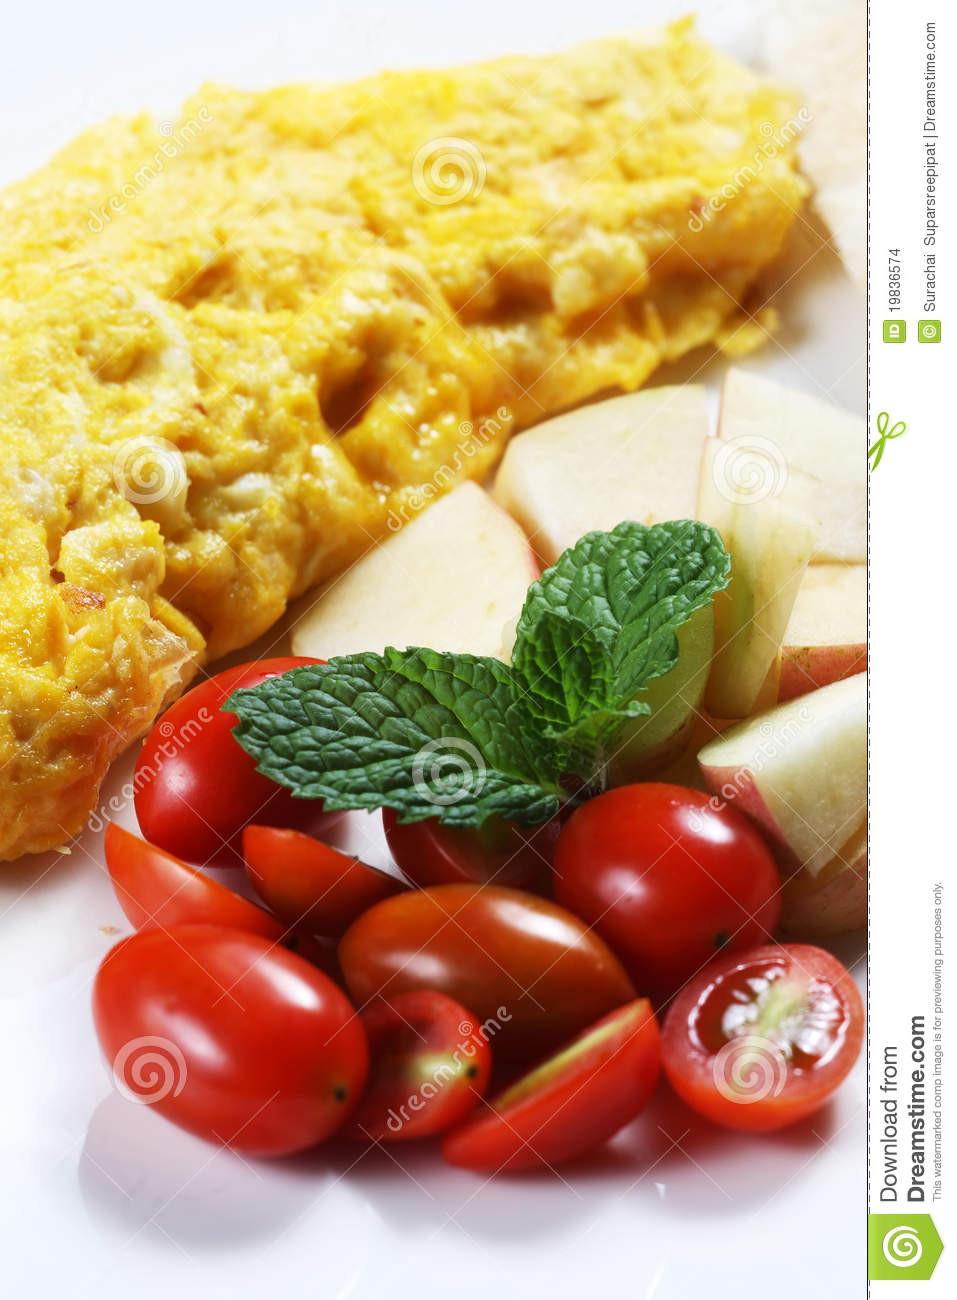 Healthy Low Fat Breakfast  Healthy Low fat Breakfast 01 Stock Image